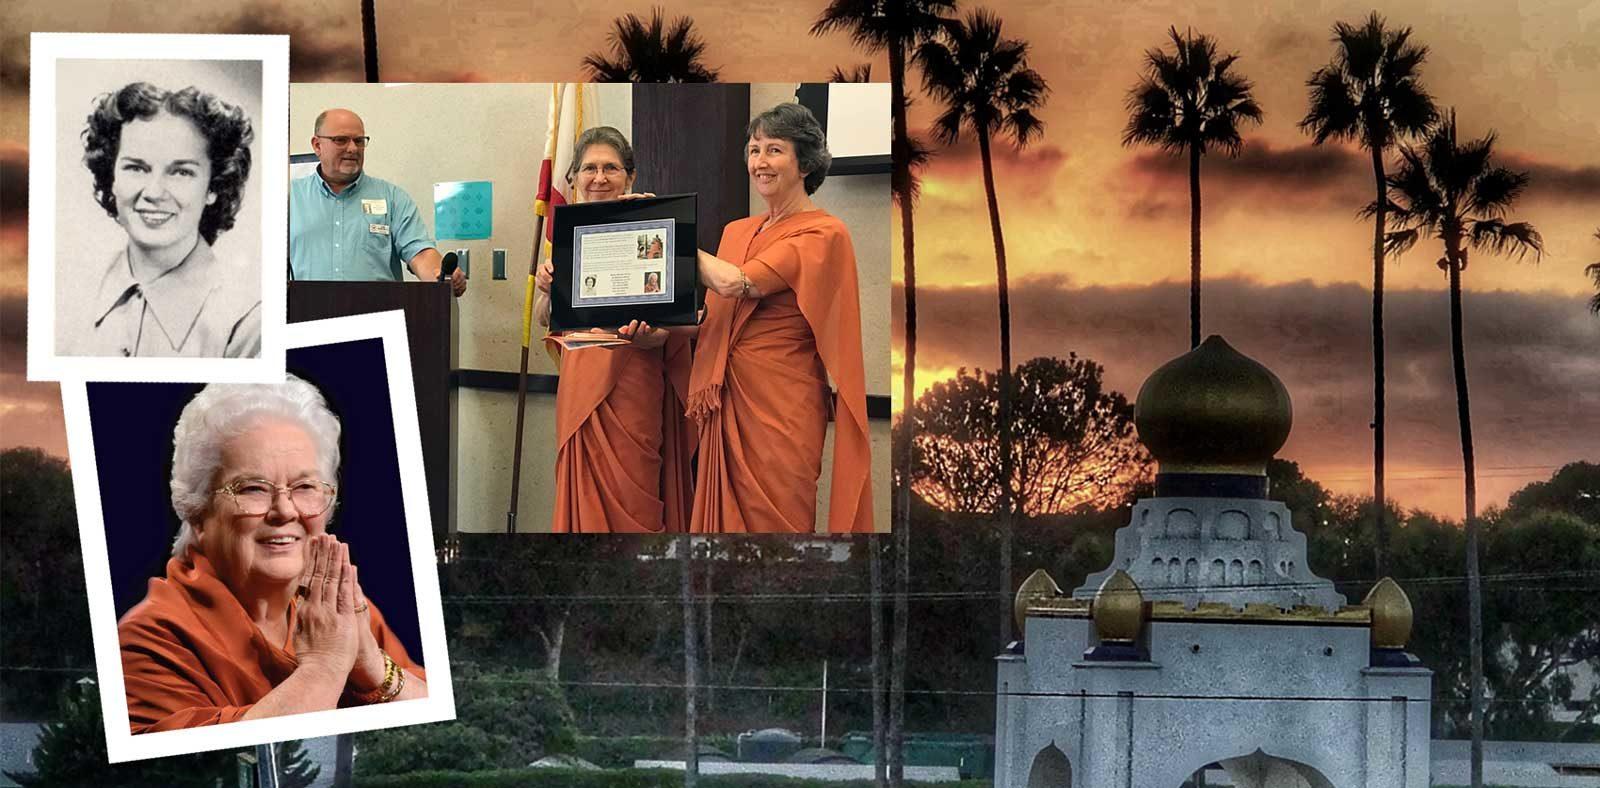 San Dieguito inducts Merna Brown ('49) AKA Sri Mrinalini Mata into the Hall of Fame